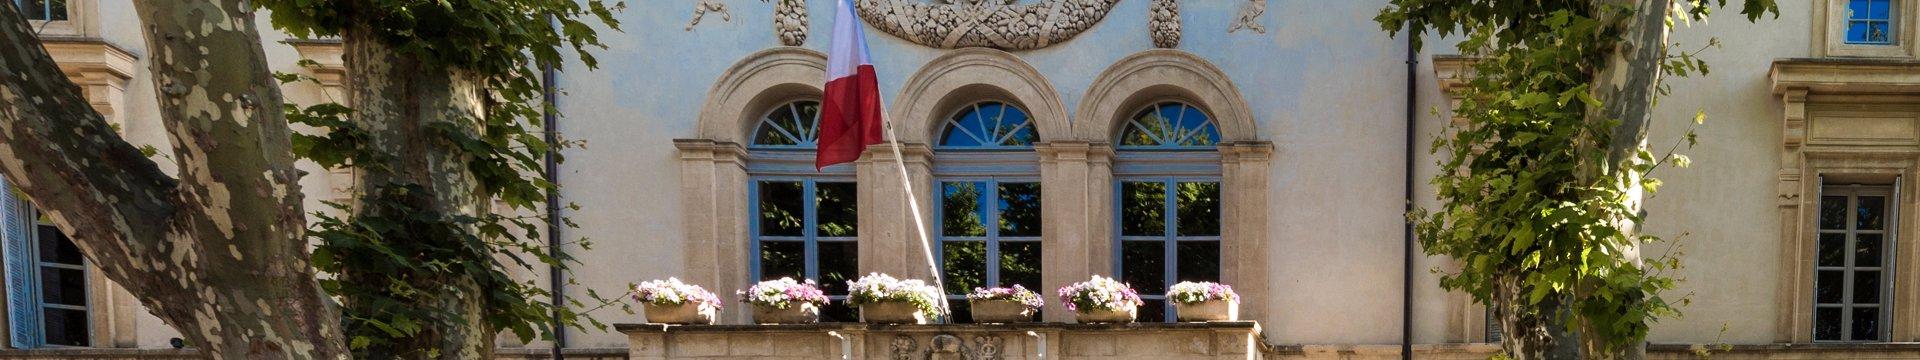 St. Rémy de Provence